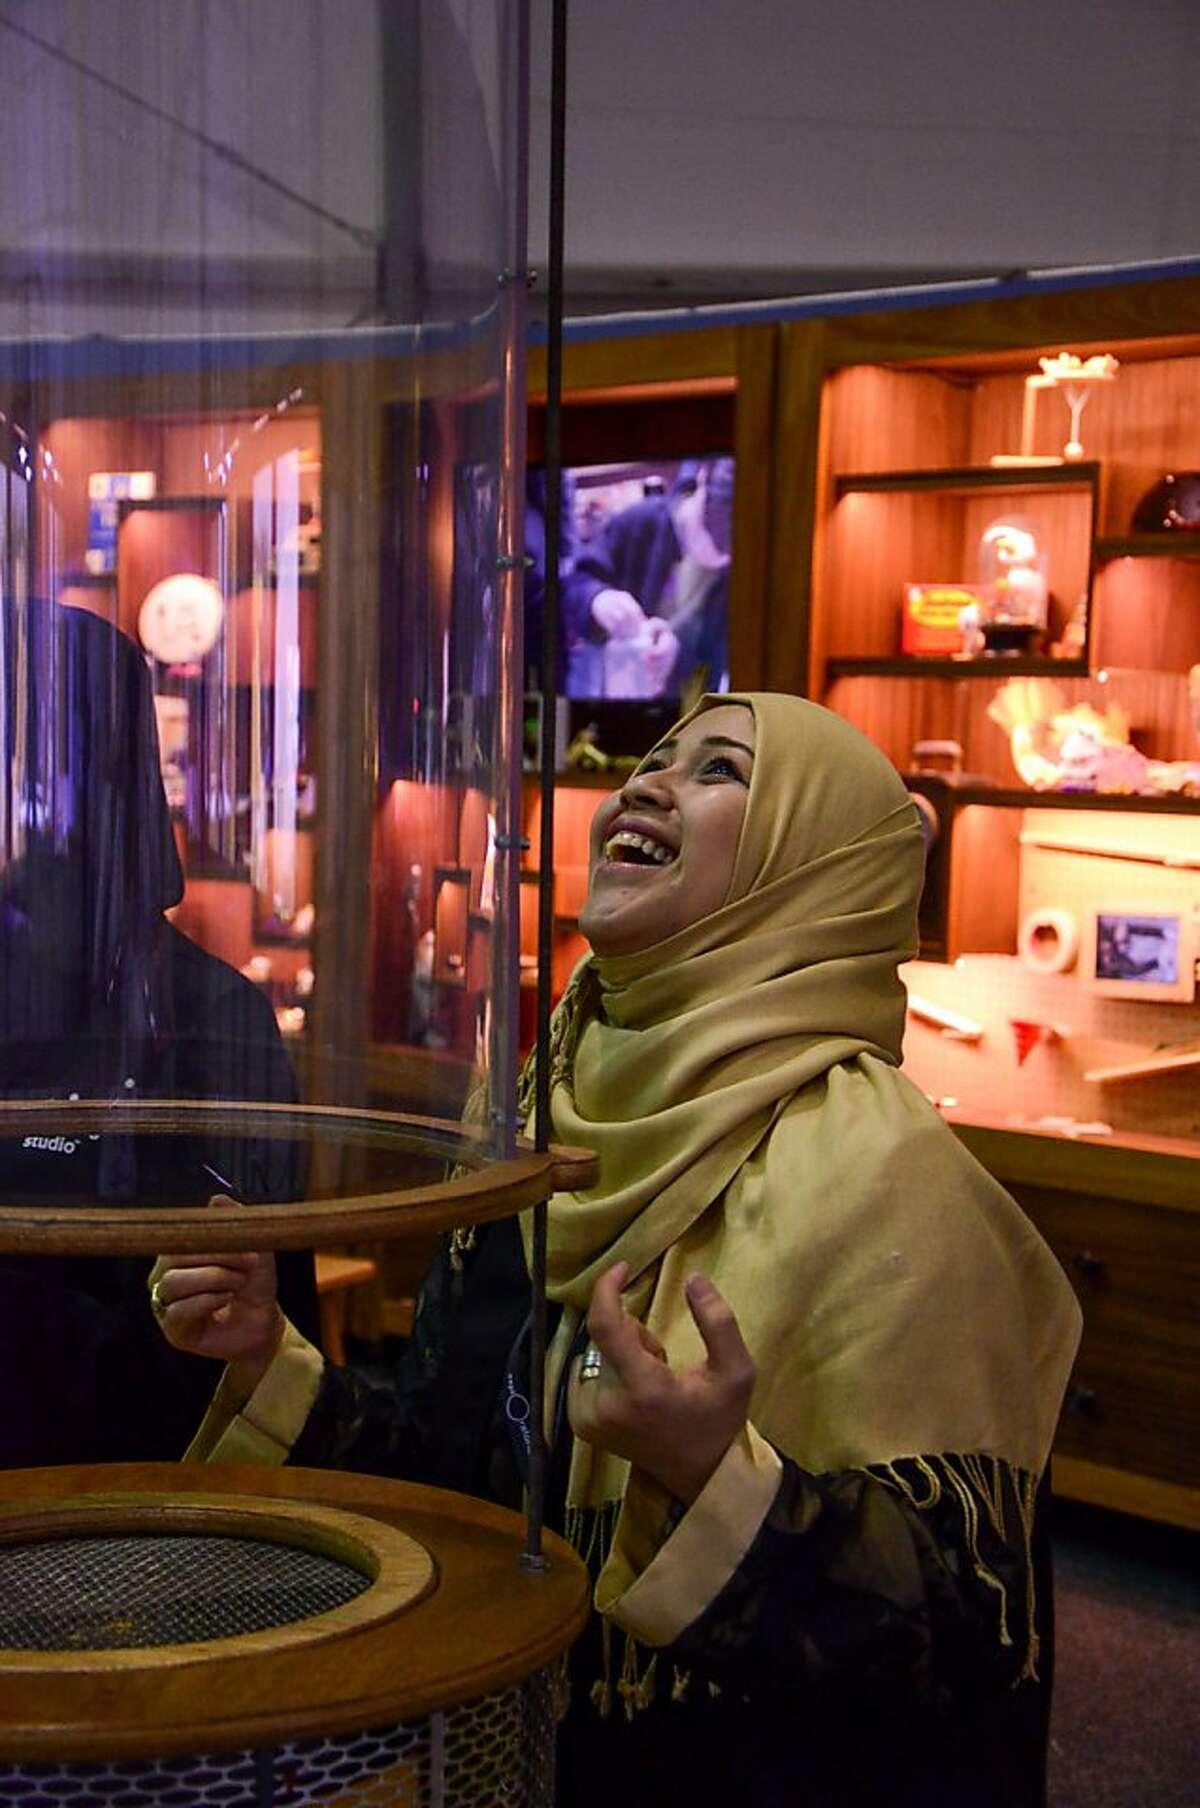 Enthusiasm for wind tubes is universal. Jehan Bantan, one of the Saudi facilitators trained by Exploratorium staff, enjoys the Wind Tube exhibit, Saudi Aramco Summer Cultural Program in Al Khobar, Saudi Arabia. Photo by Luigi Anzivino, Exploratorium